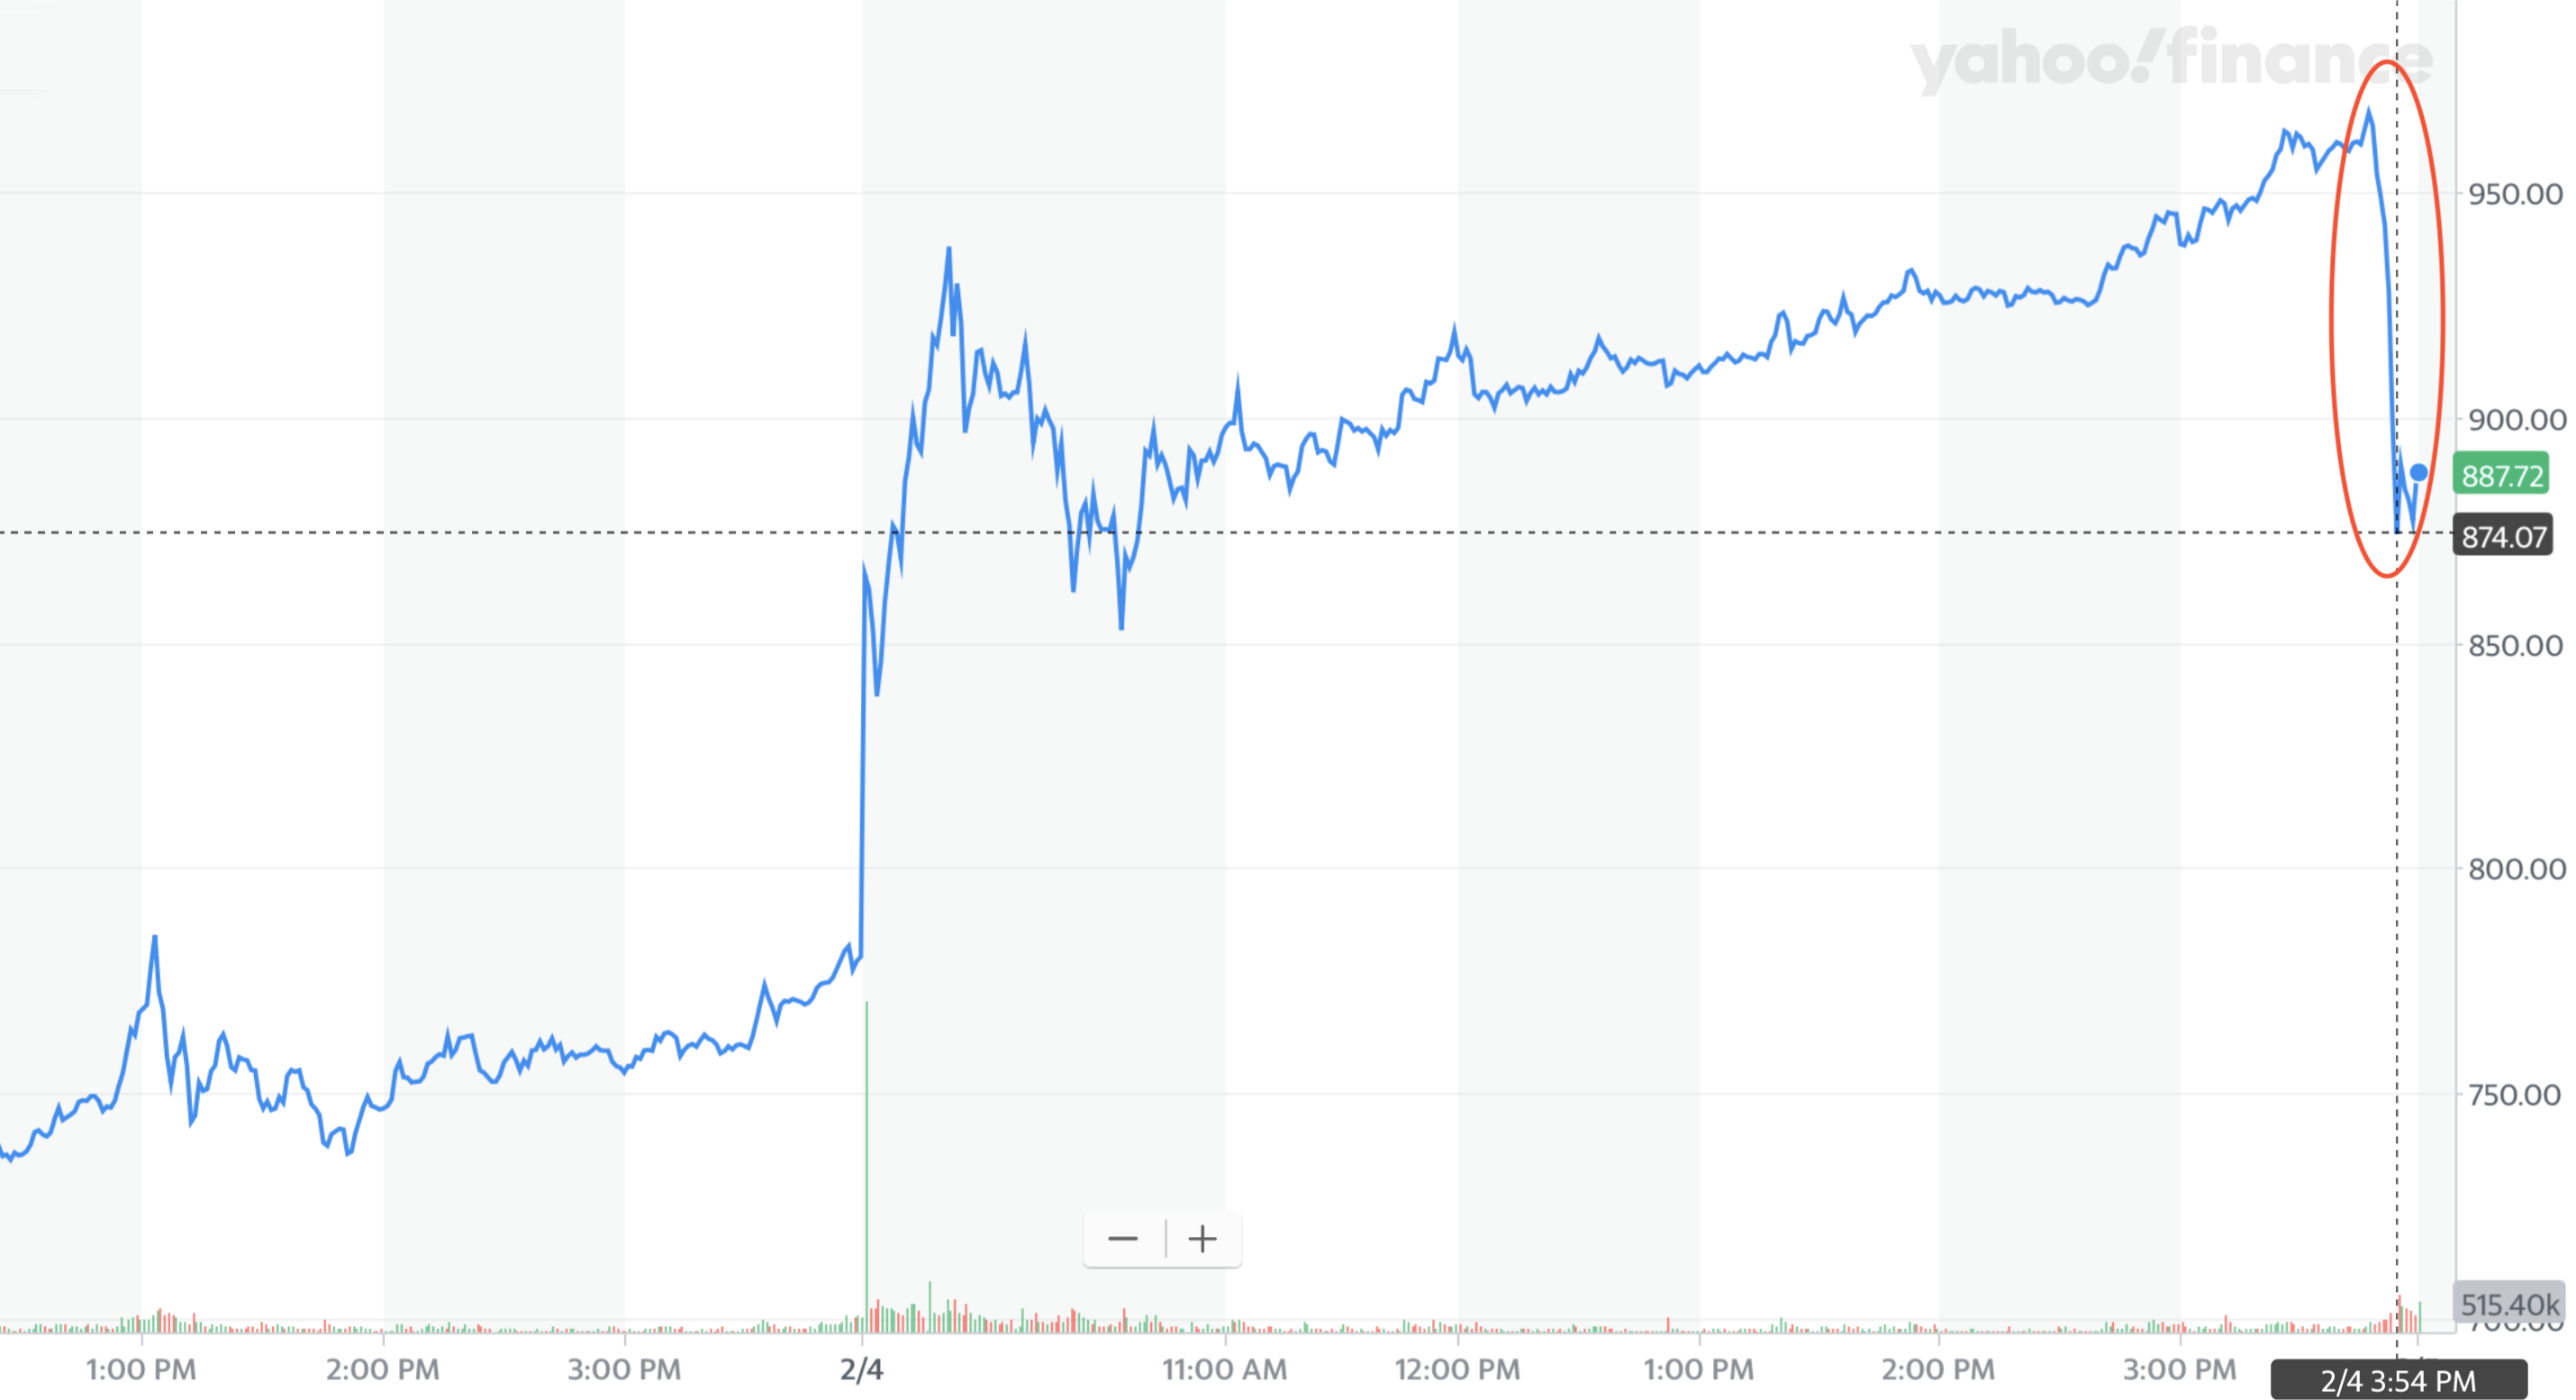 Tesla Inc share price drop